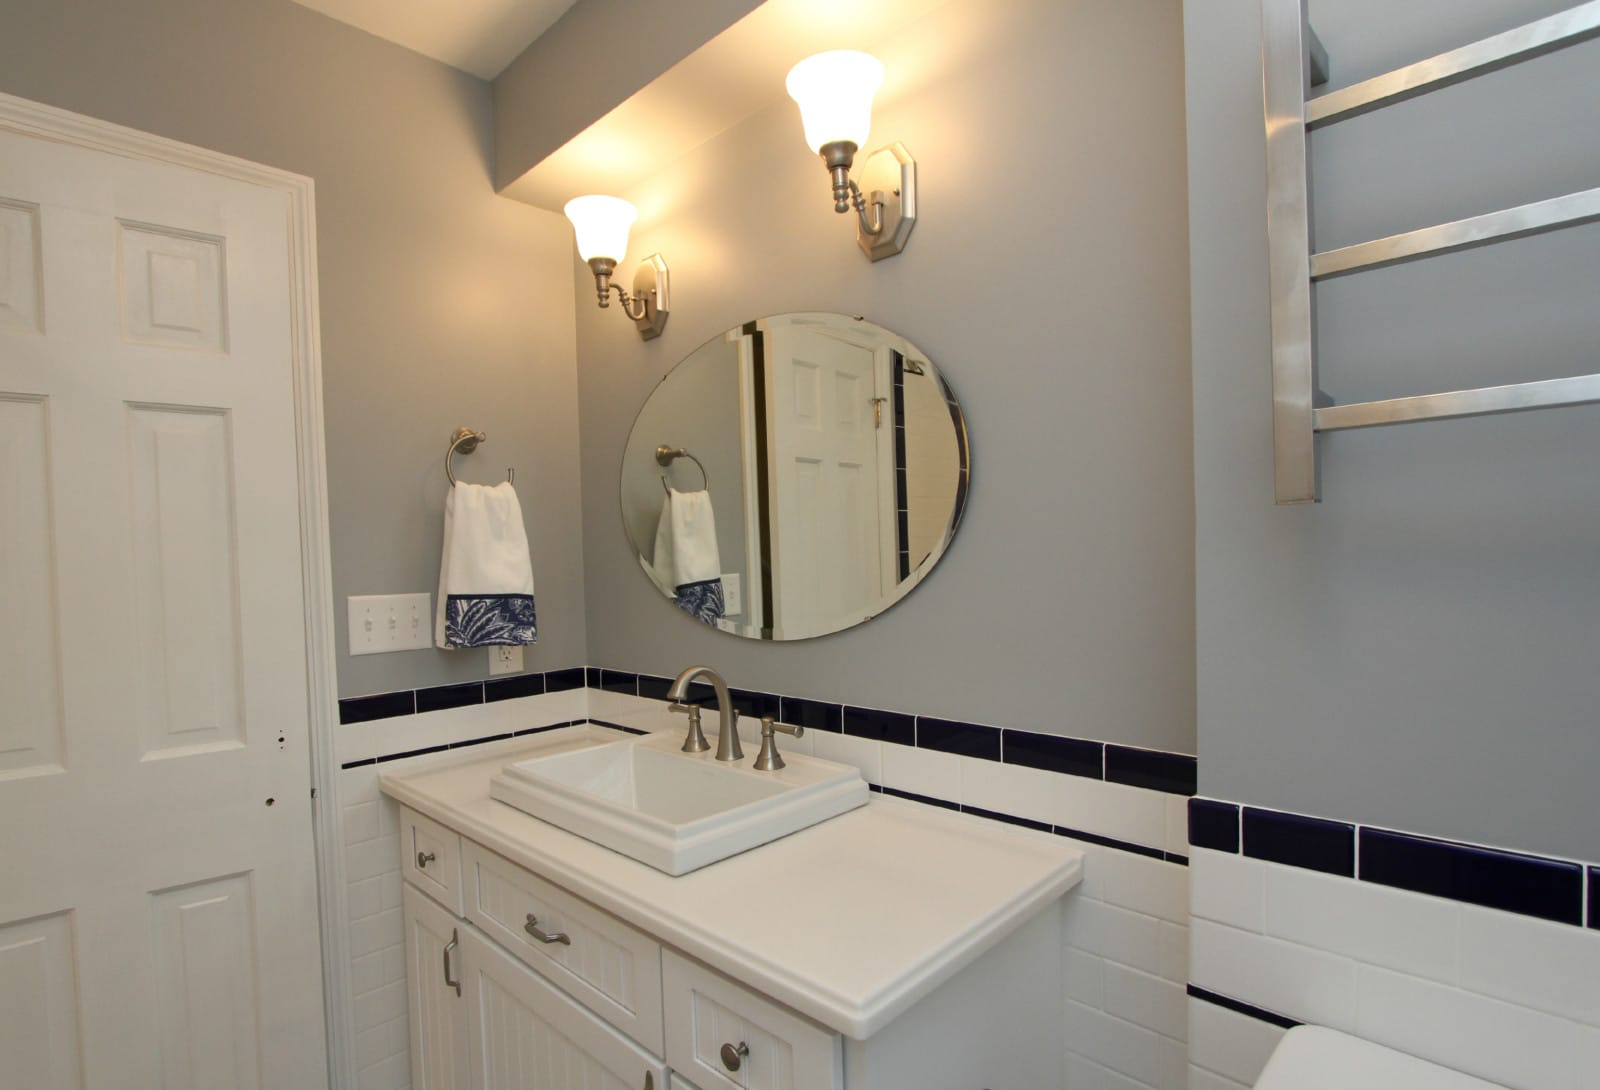 Bathroom sinks that work,bathroom remodeling contractor,Choosing a bathroom Sink,new bathroom shower contractor maryland,licensed bathroom contractors,bathroom additions baltimore,Accessable senior bathroom,disabled vets bathroom remodeling marylnd